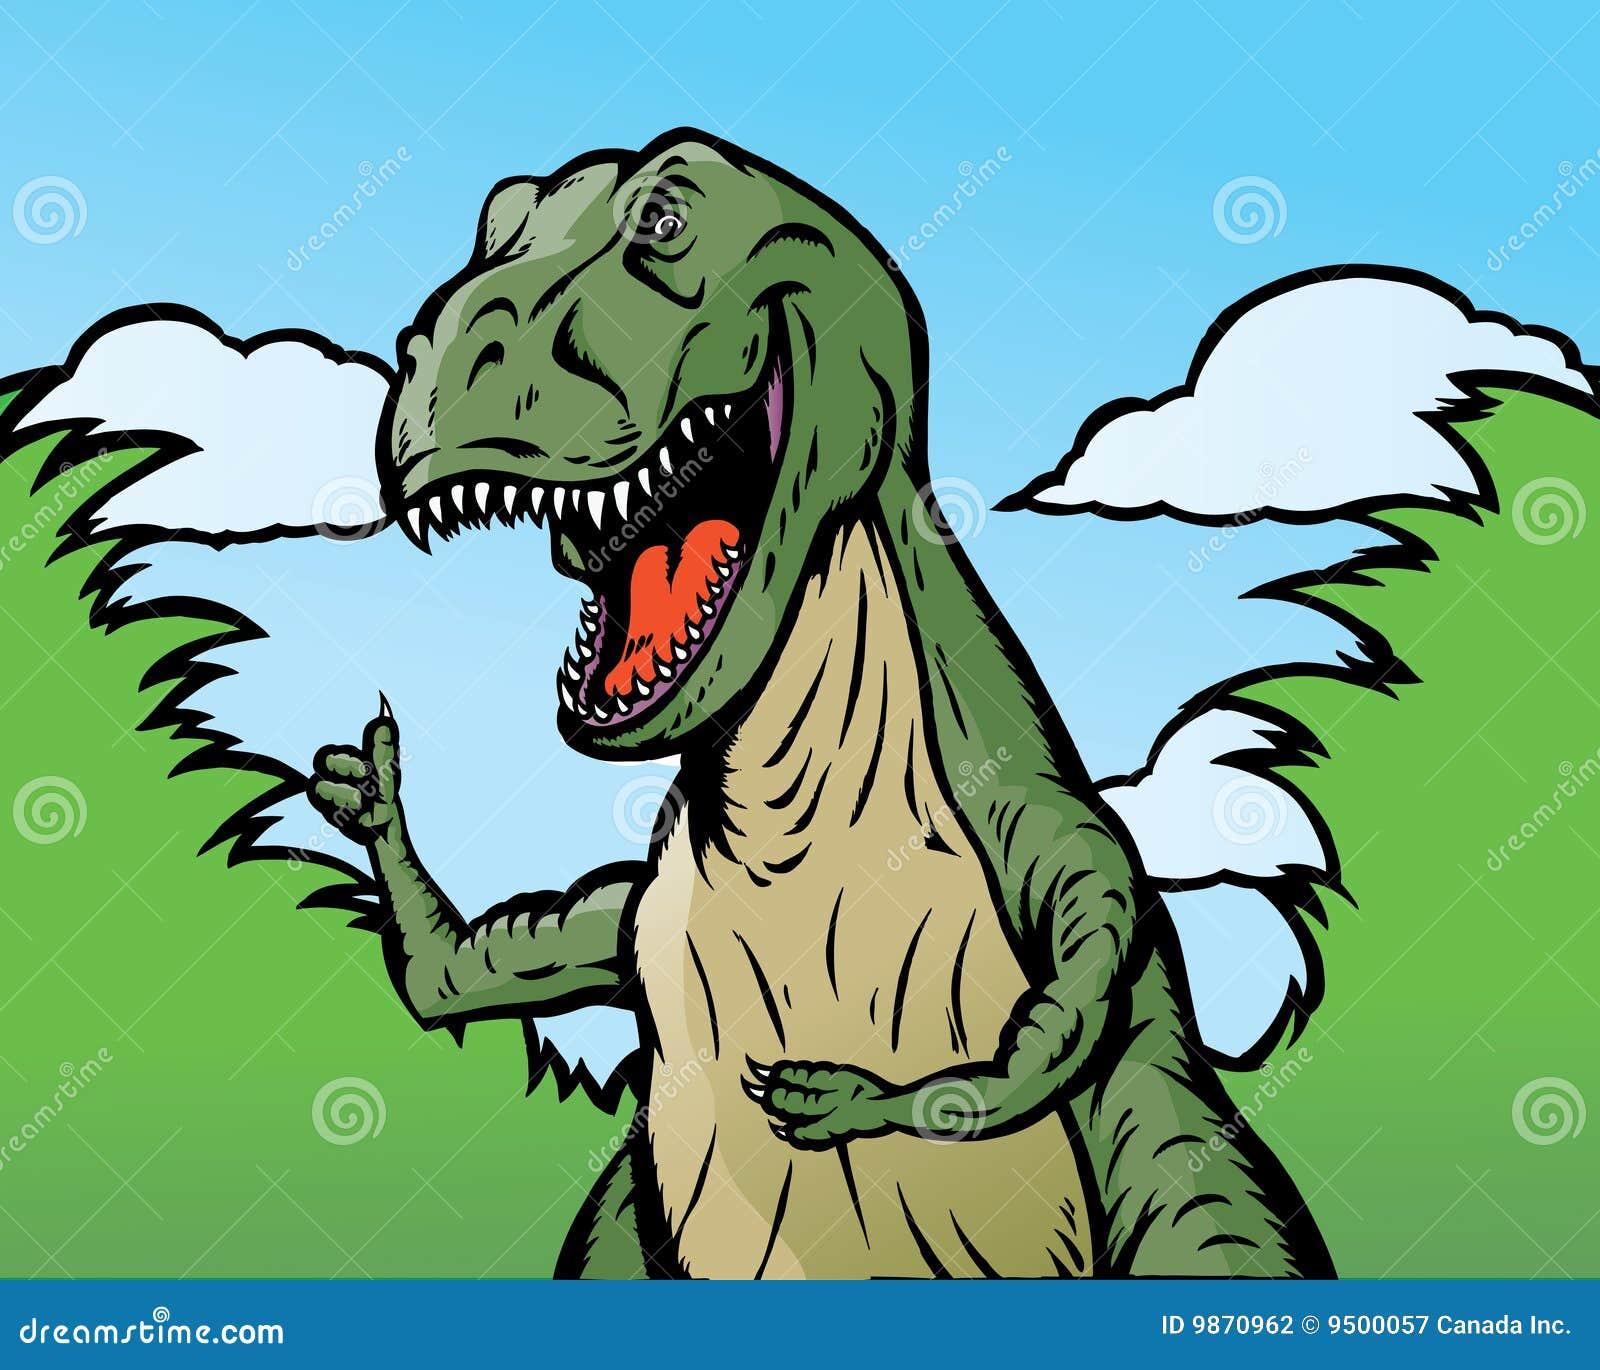 Dinosaur thumbs up